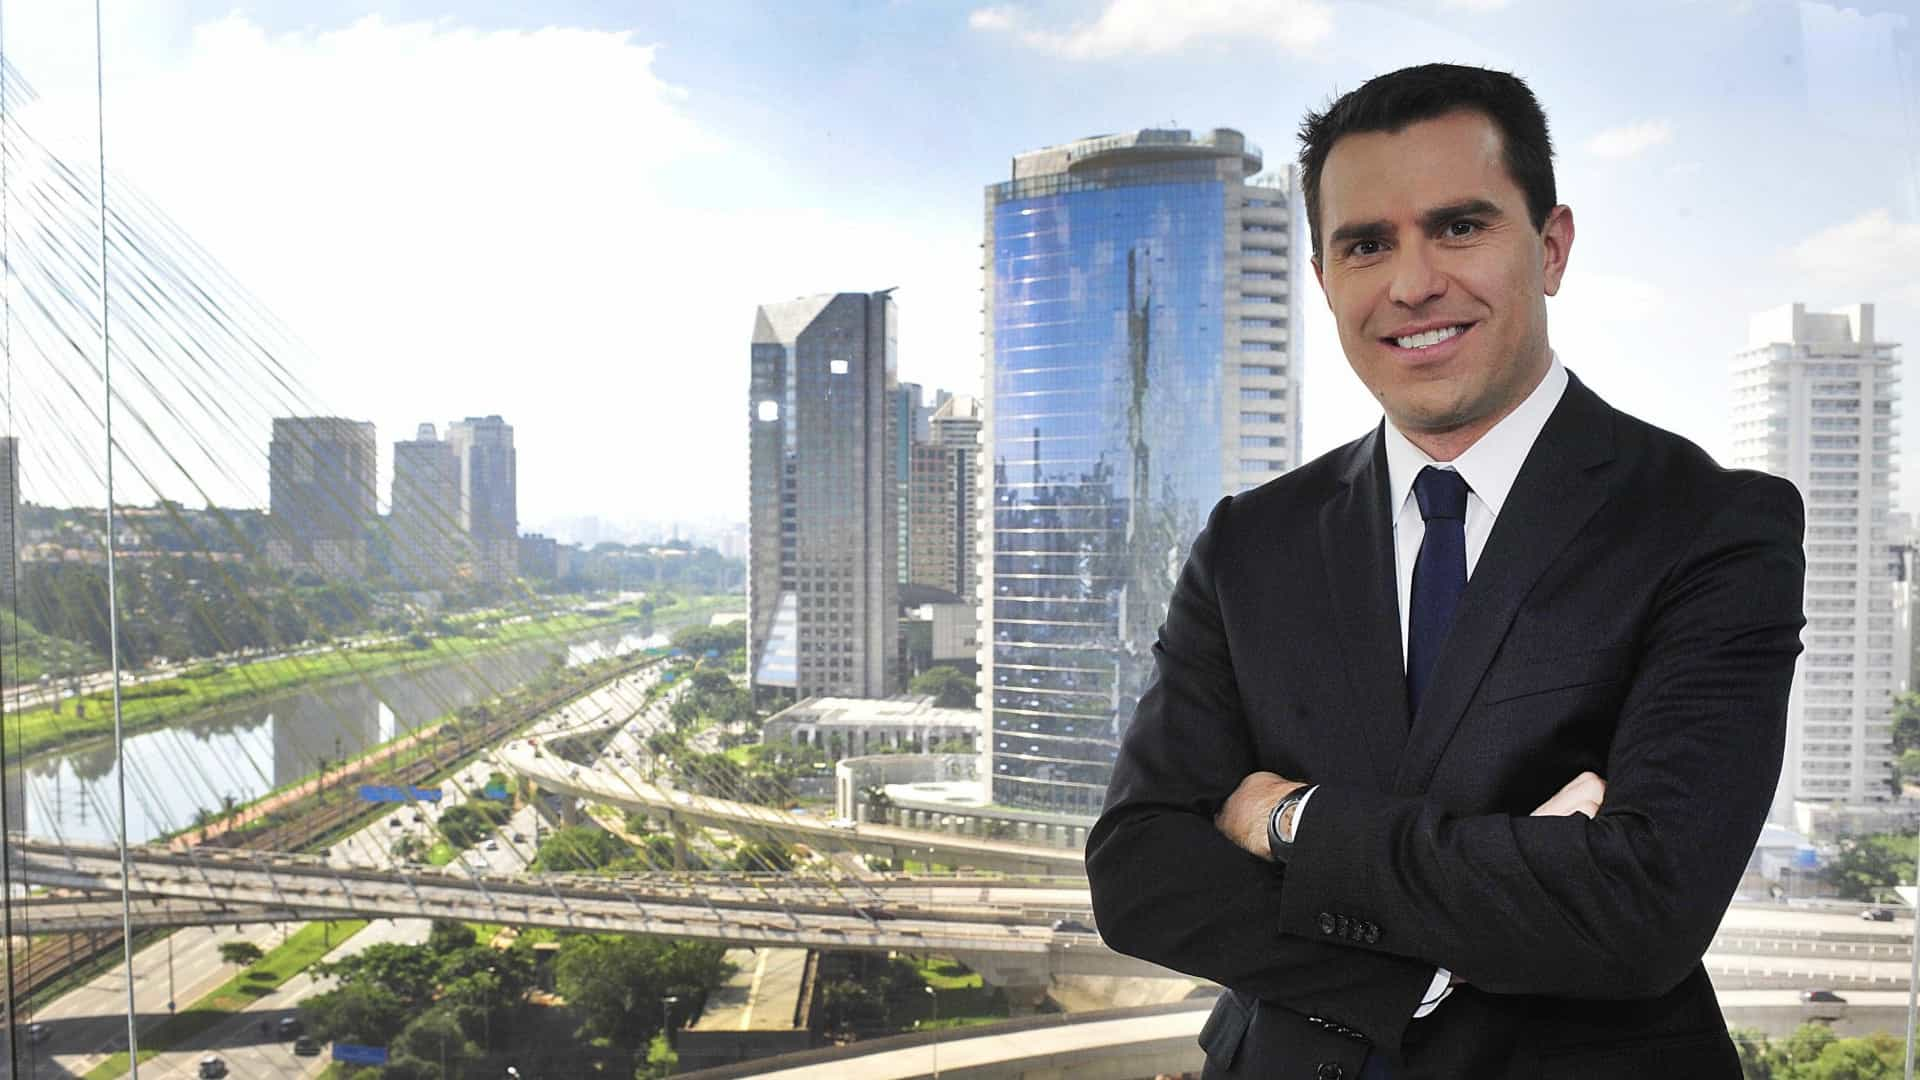 Record quer contratar grandes nomes do jornalismo da Globo